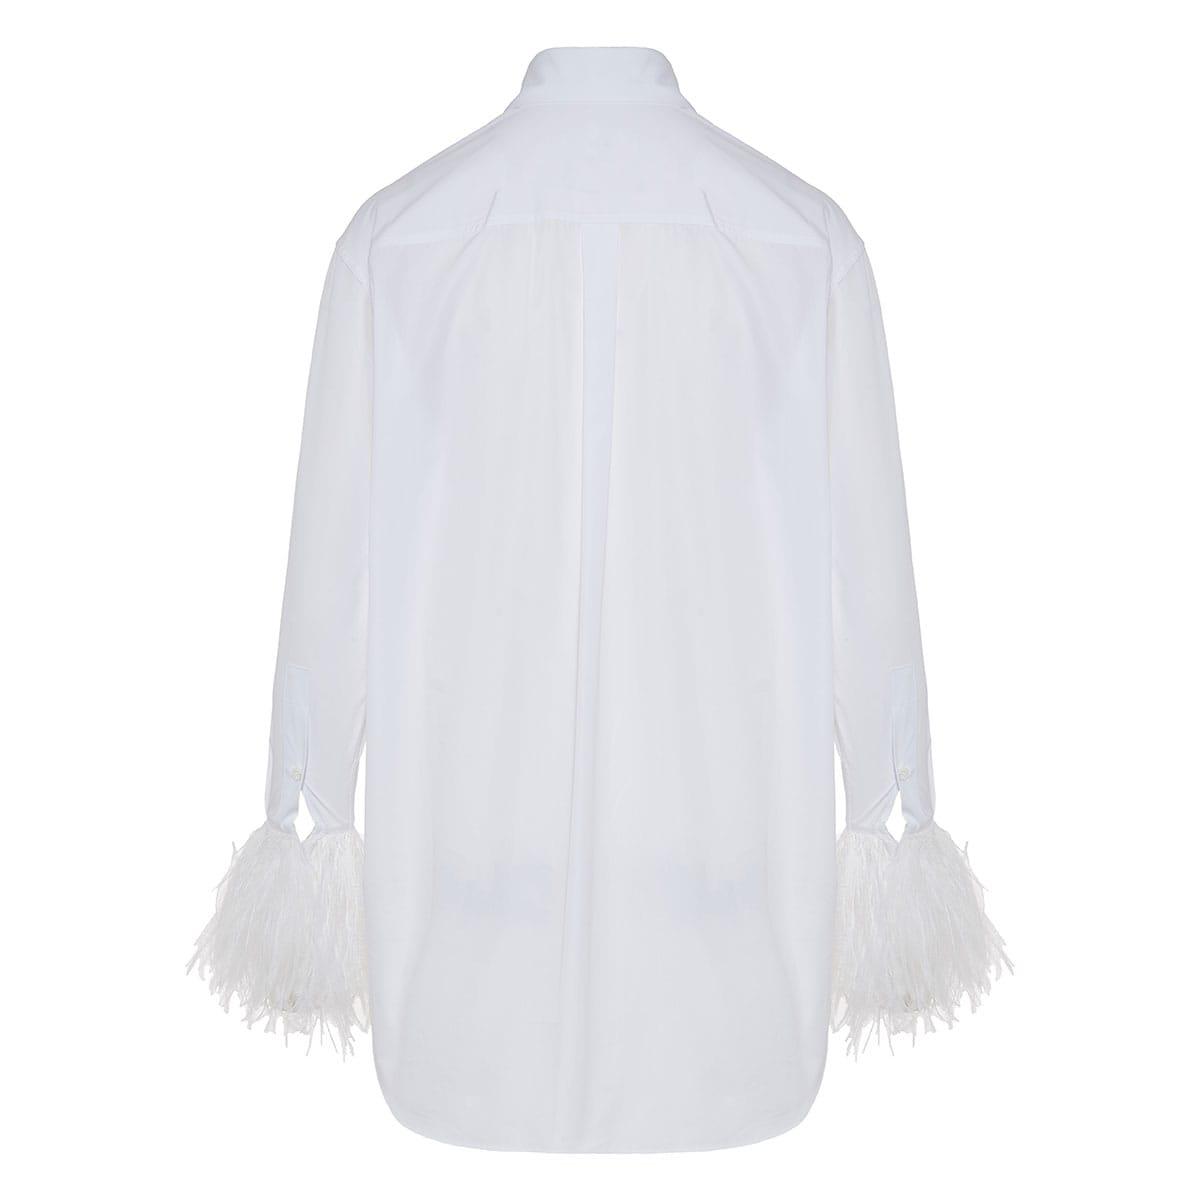 Poplin shirt with feather cuffs